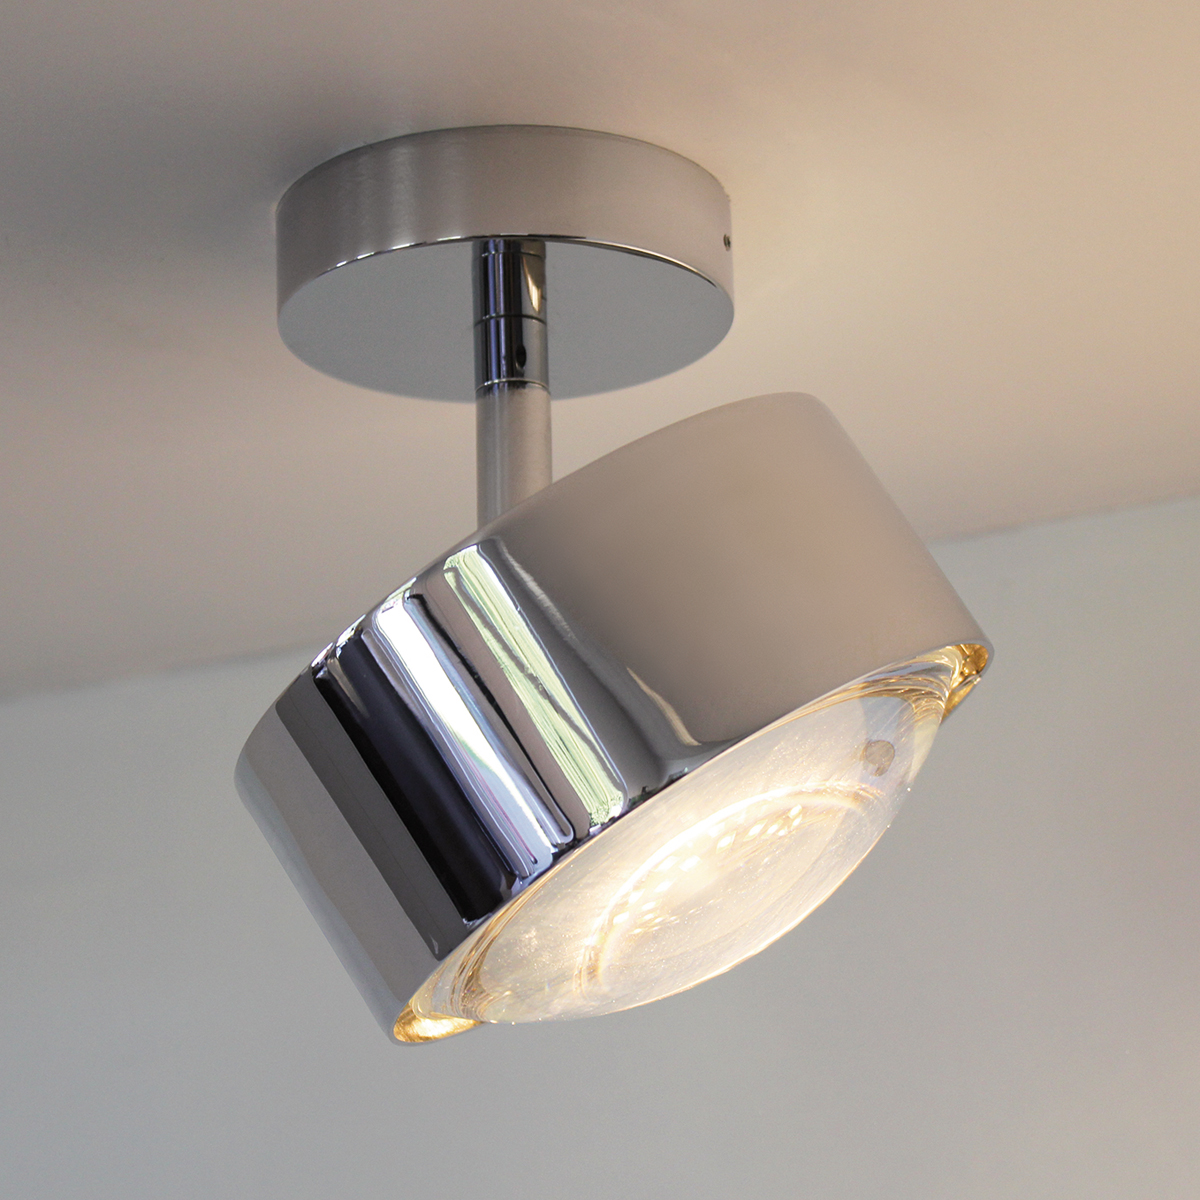 top light puk maxx turn led up down deckenleuchte. Black Bedroom Furniture Sets. Home Design Ideas